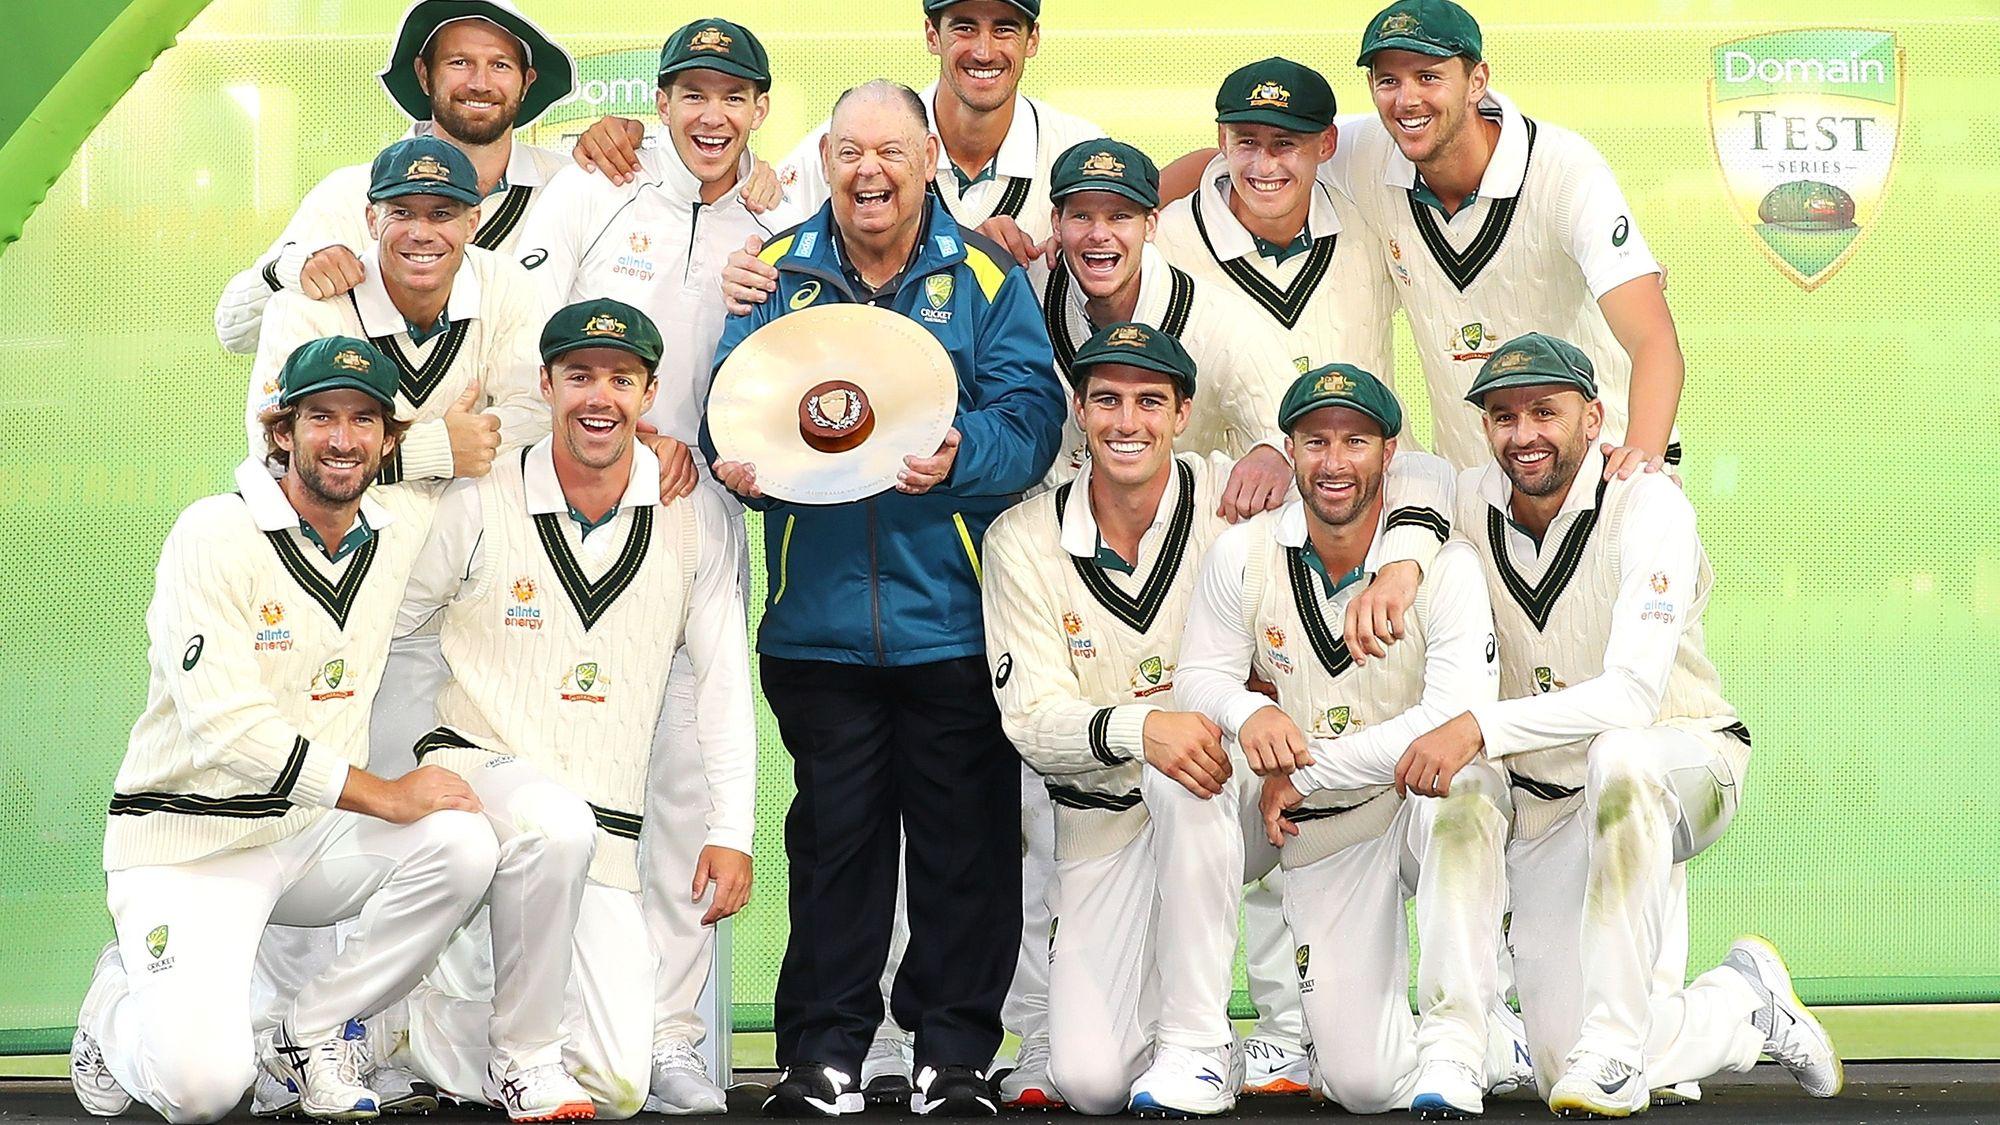 Live Cricket Scores & News International Cricket Council